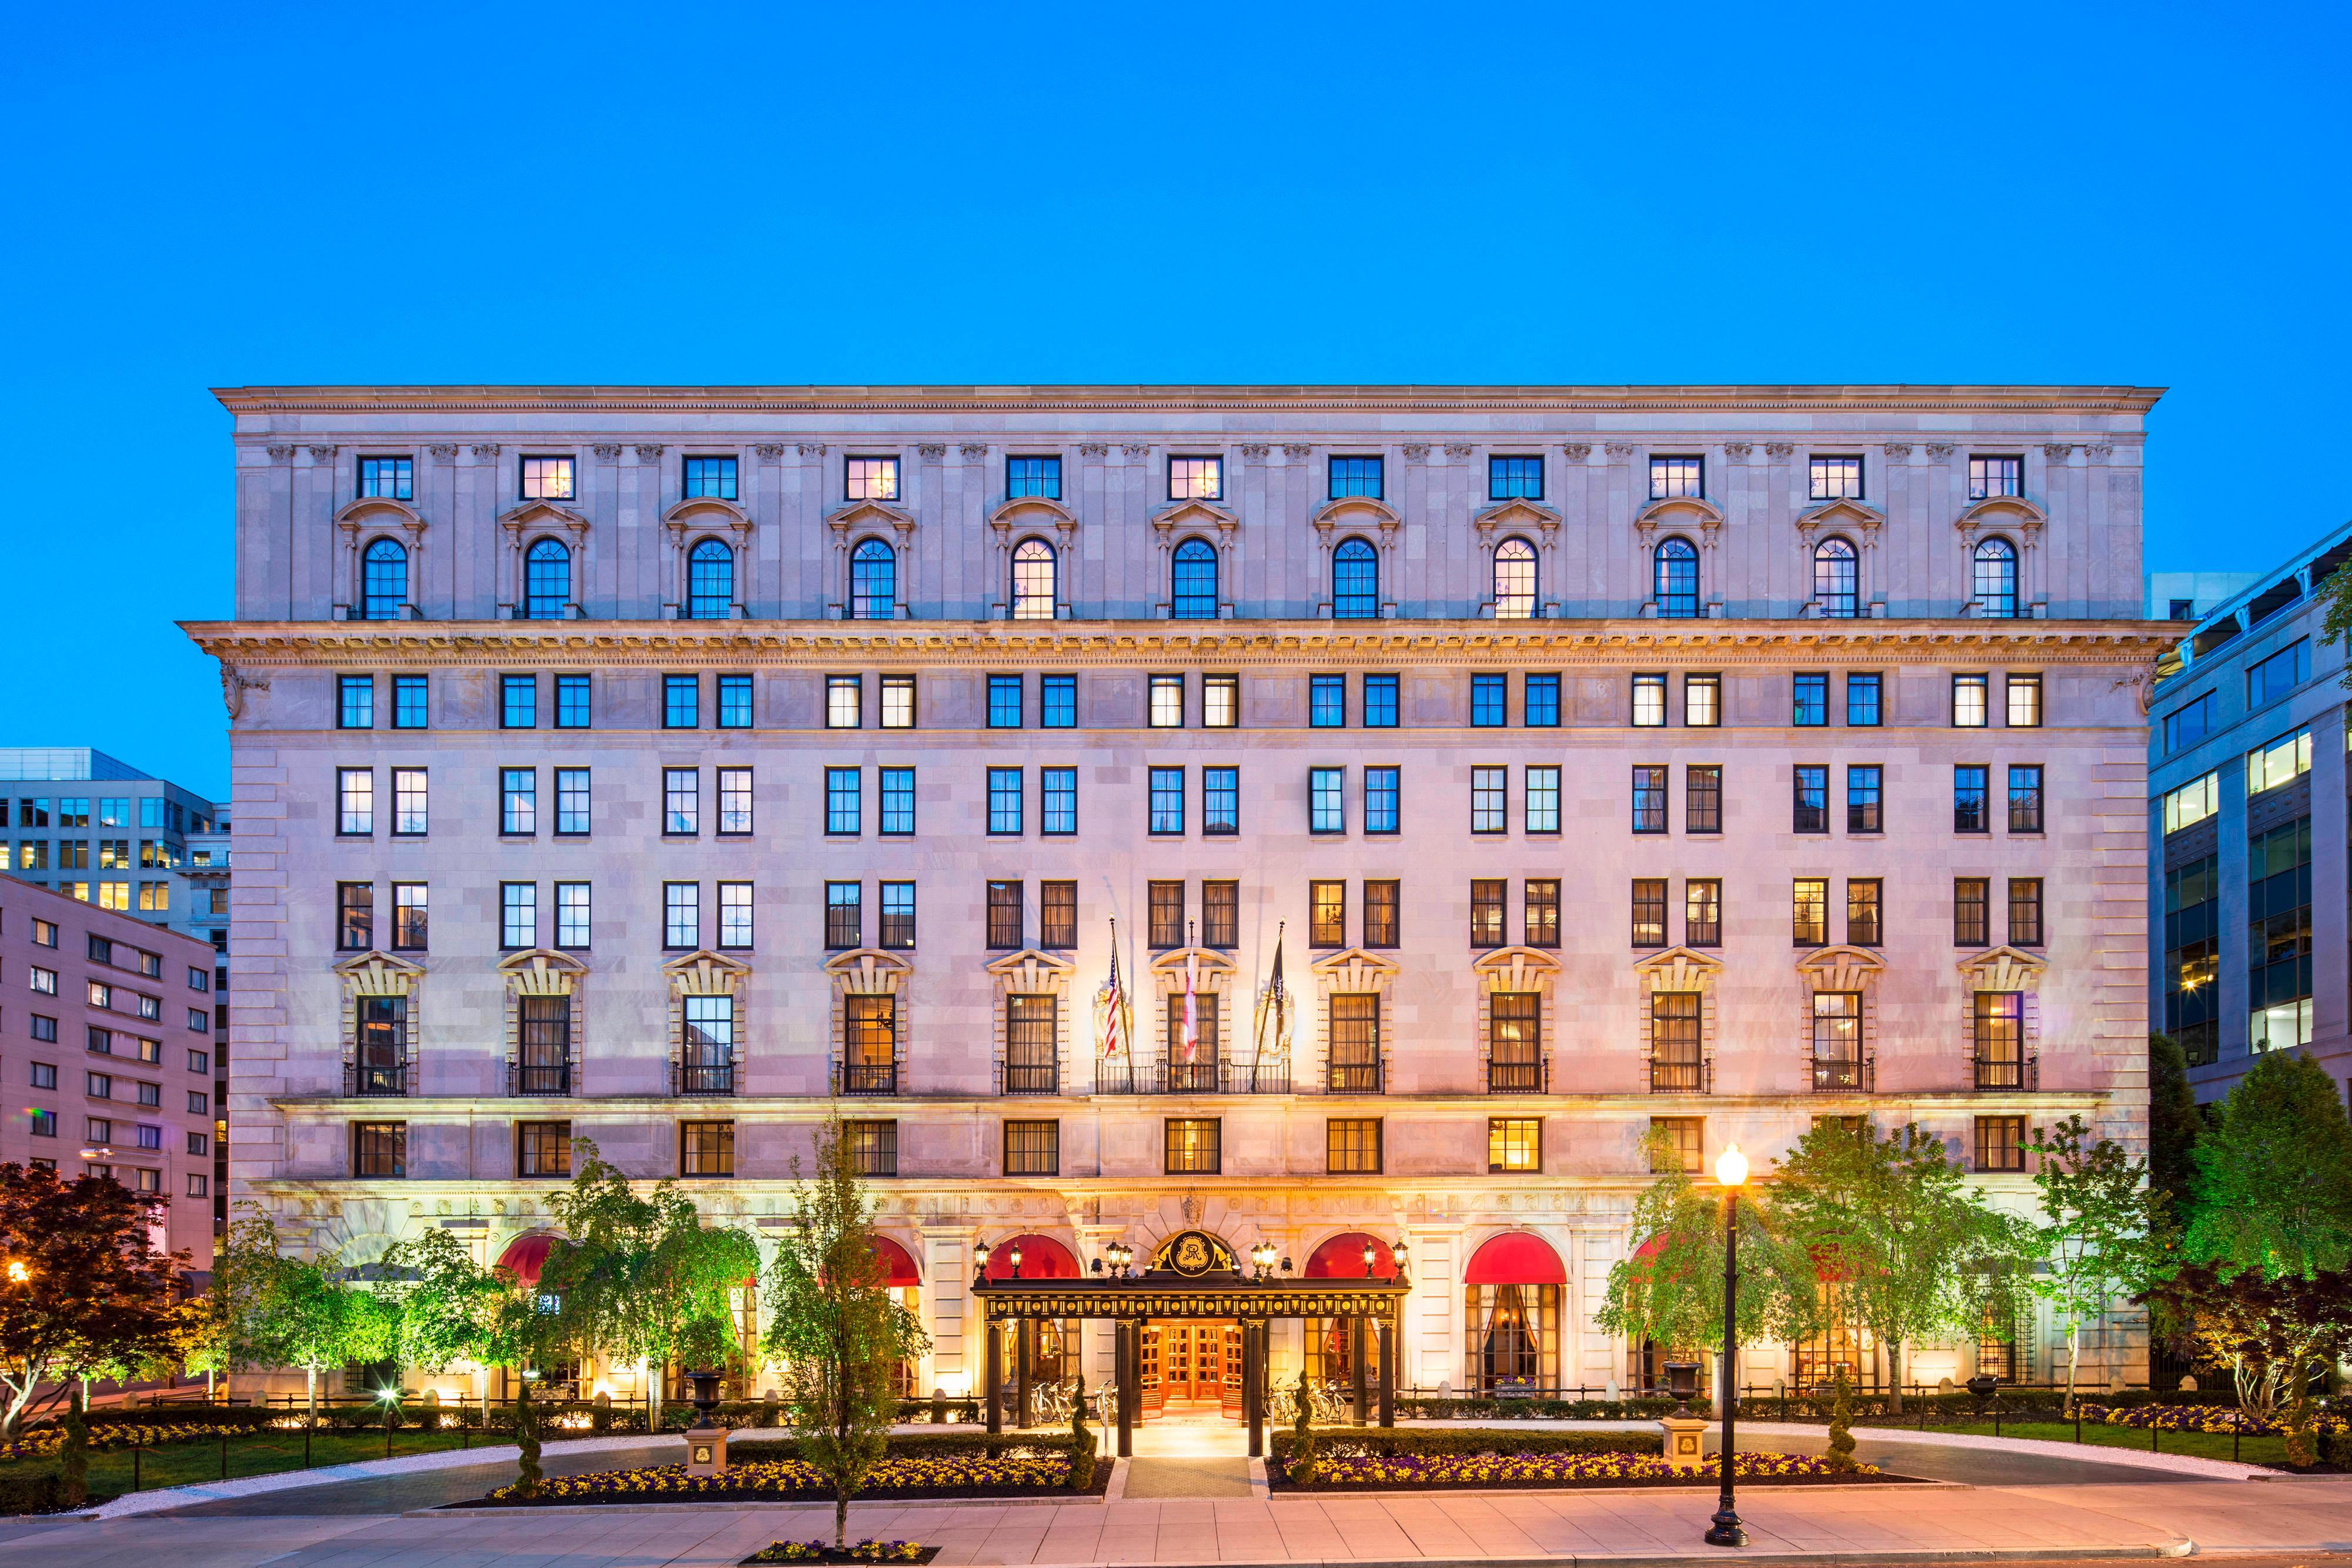 St. Regis Hotel Washington Dc